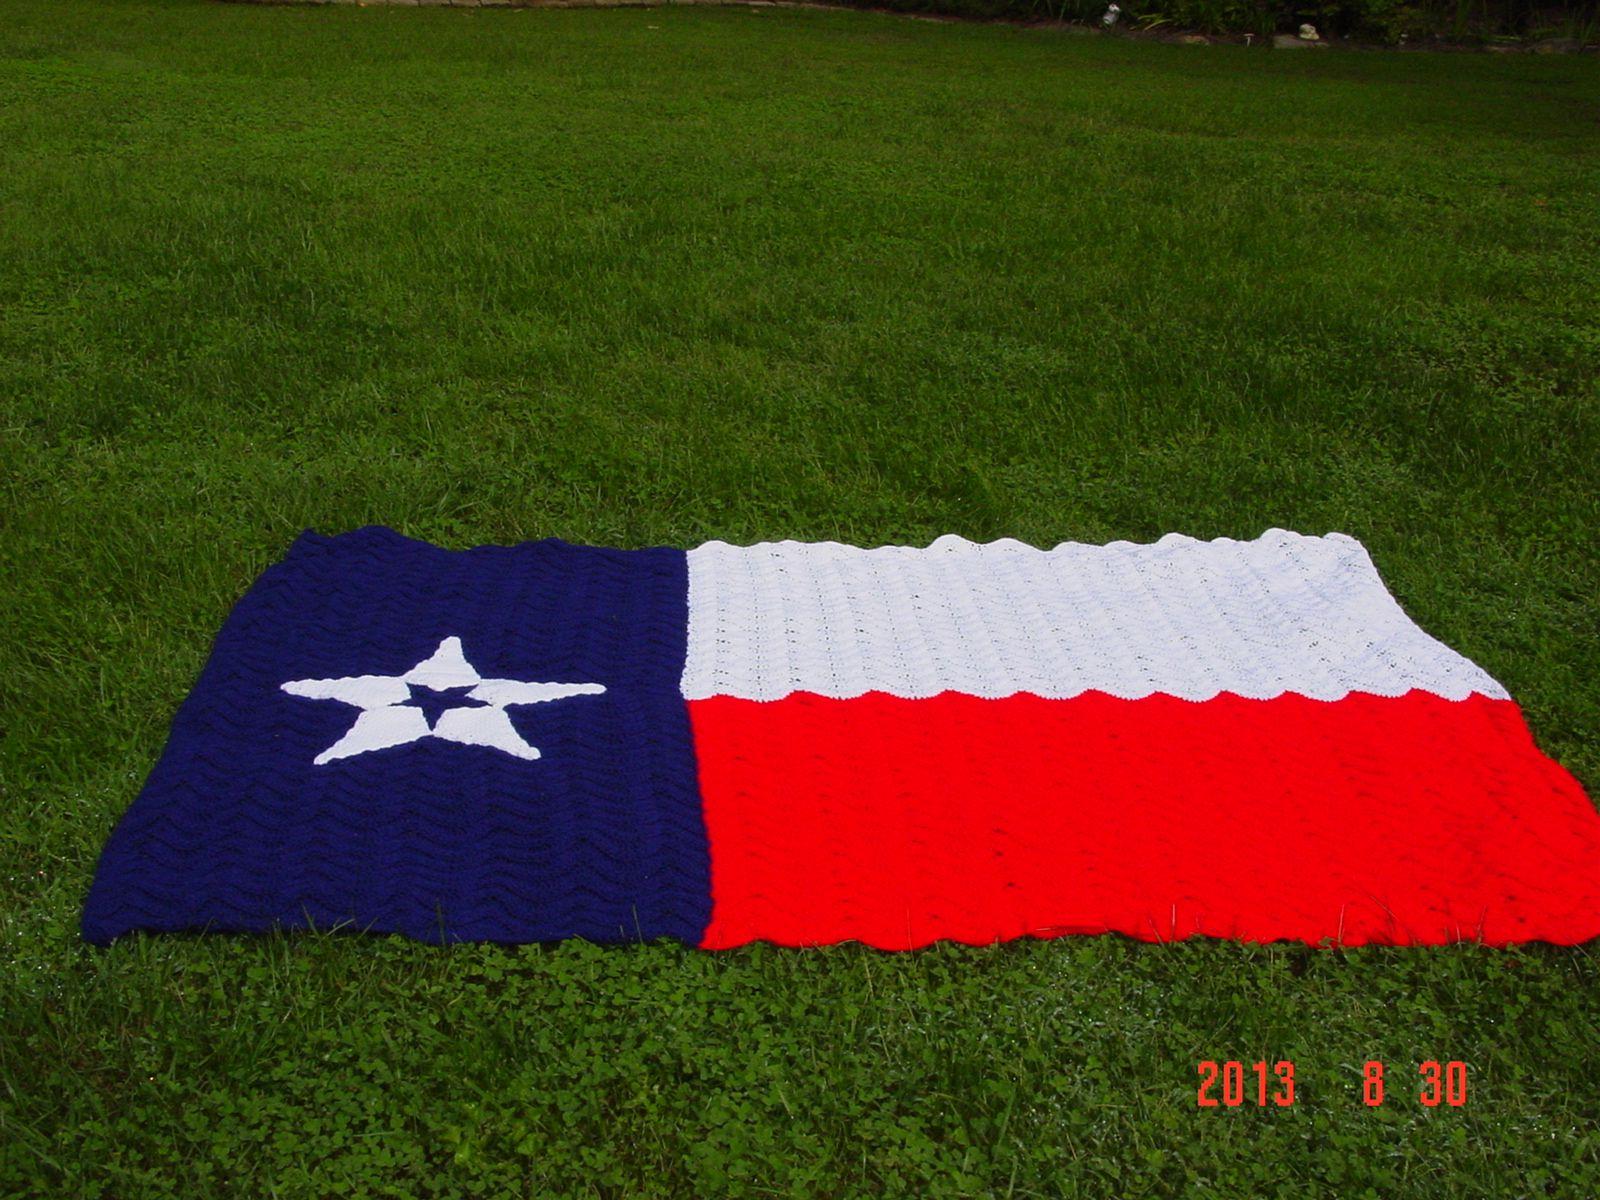 Crochet Afghan Texas Flag Crochet Afghan Texas Flag Crafts Flag Crafts